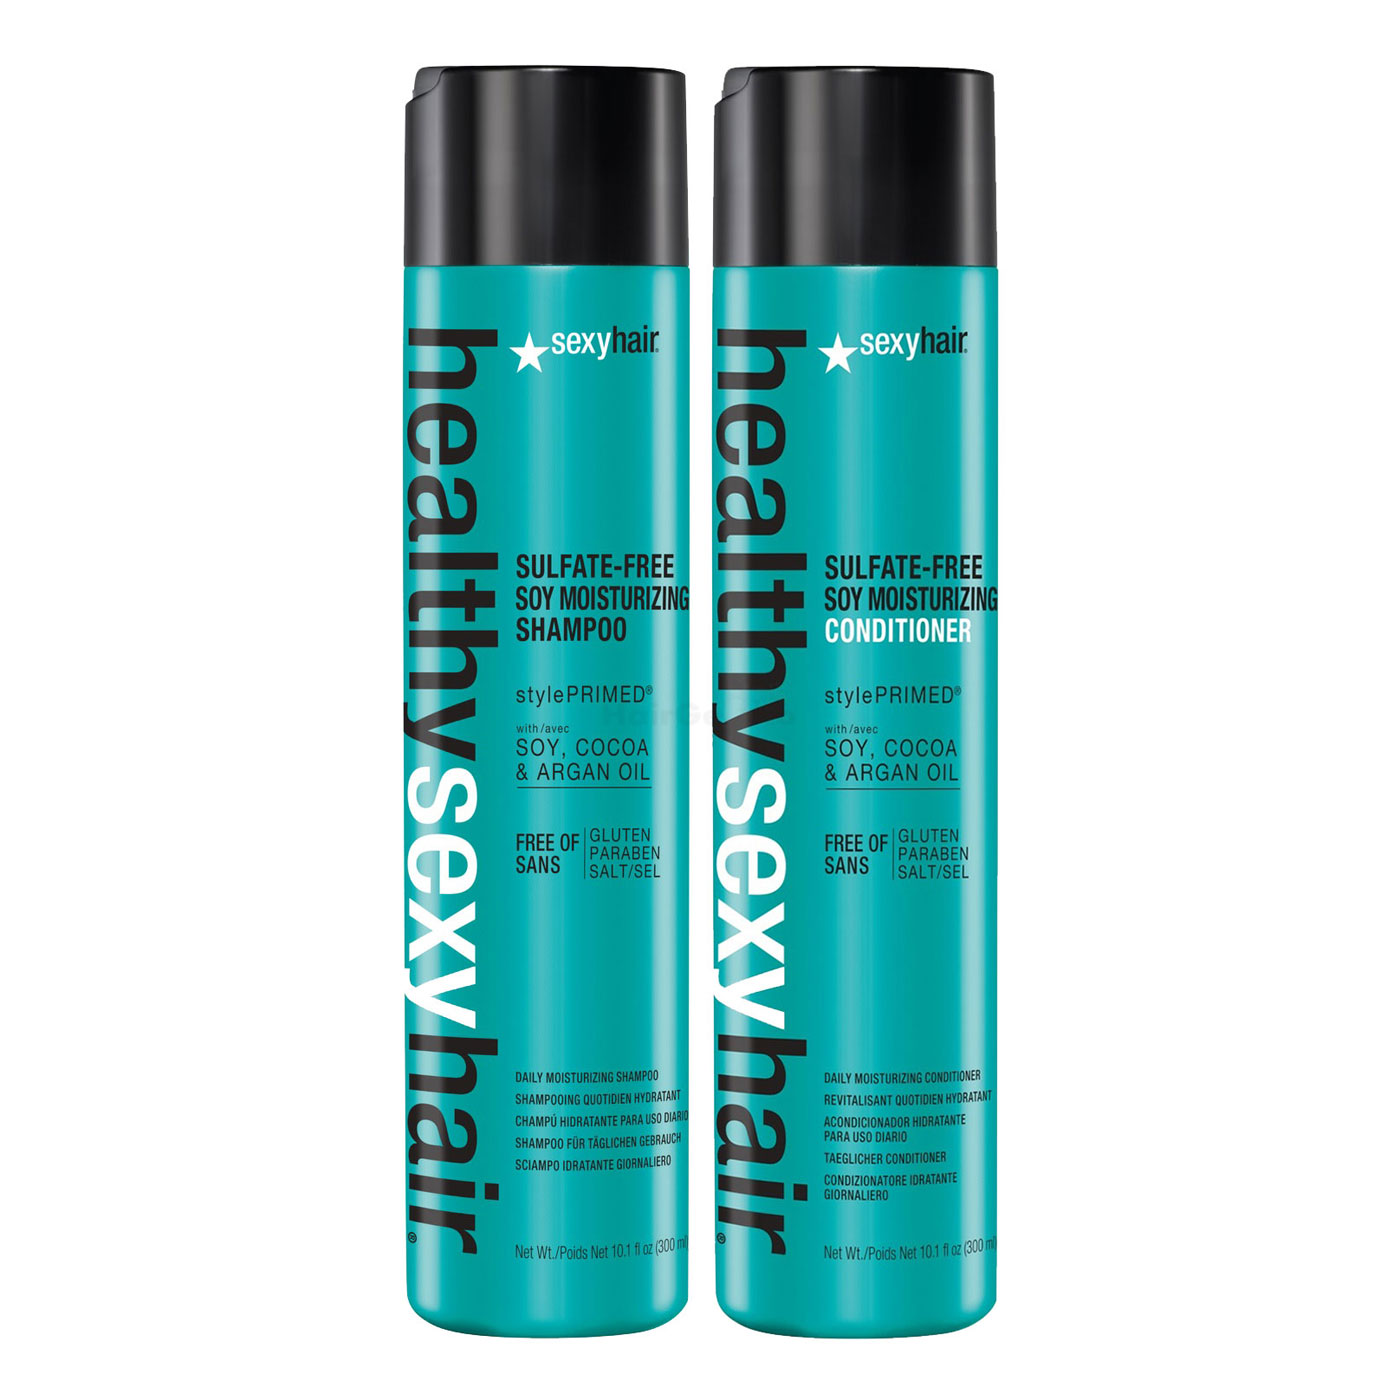 Sexy Hair Healthy Soy Moisturizing Set - Shampoo 300ml + Conditioner 300ml